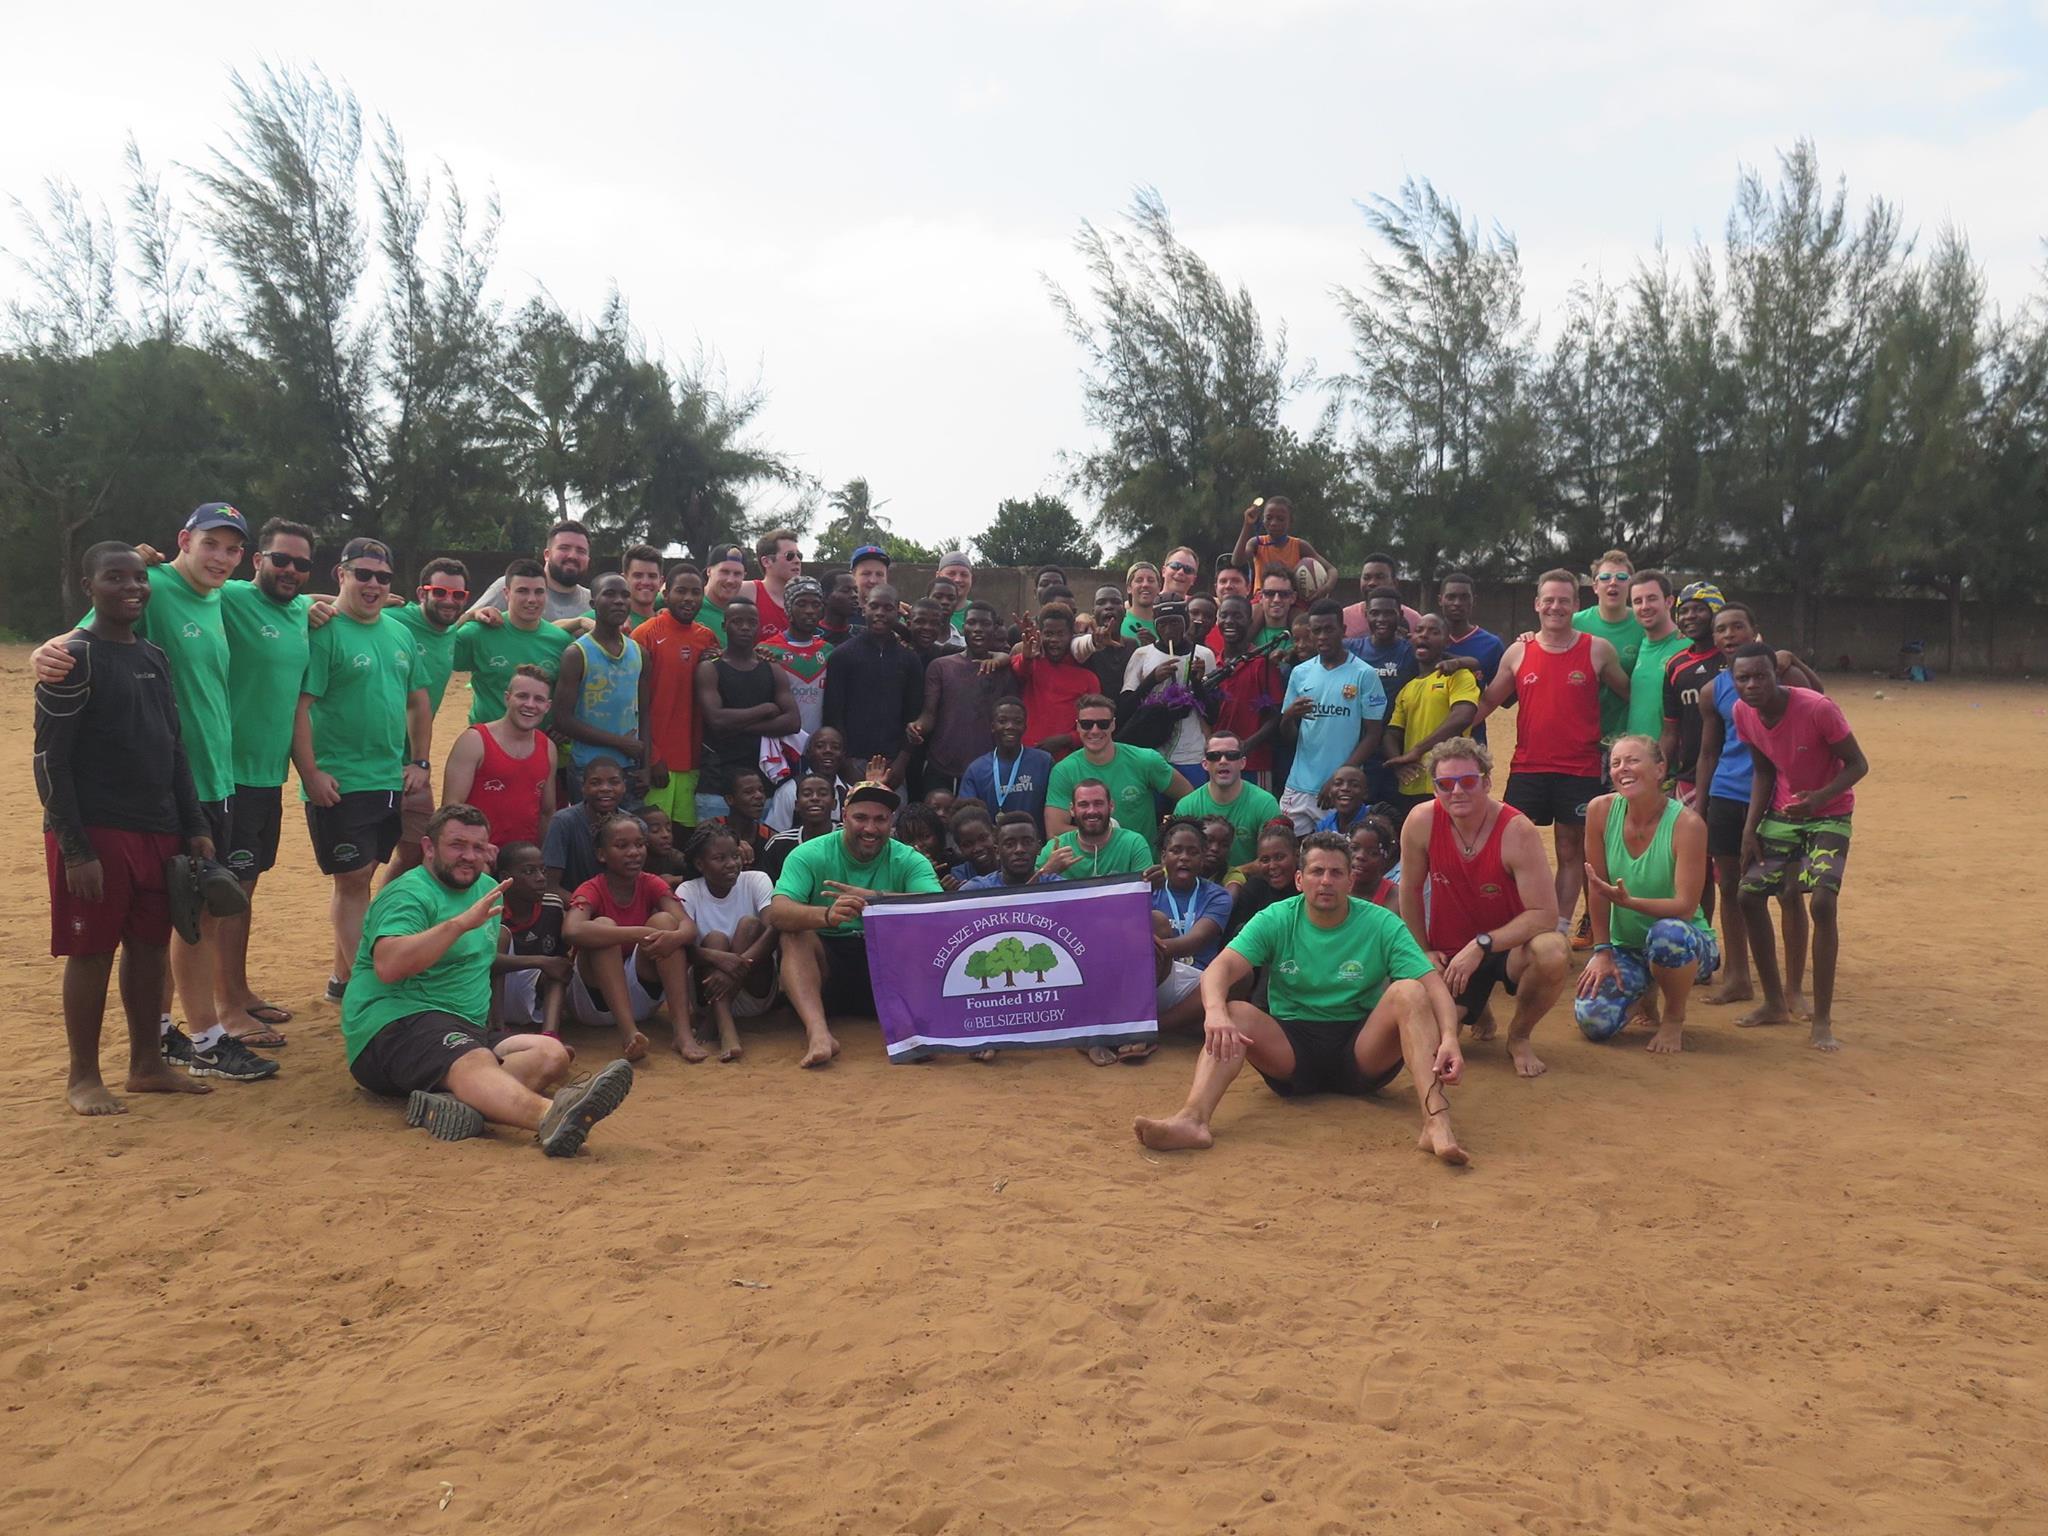 https://www.bprfc.co.uk/wp-content/uploads/2019/10/Tour_Mozambique.jpg